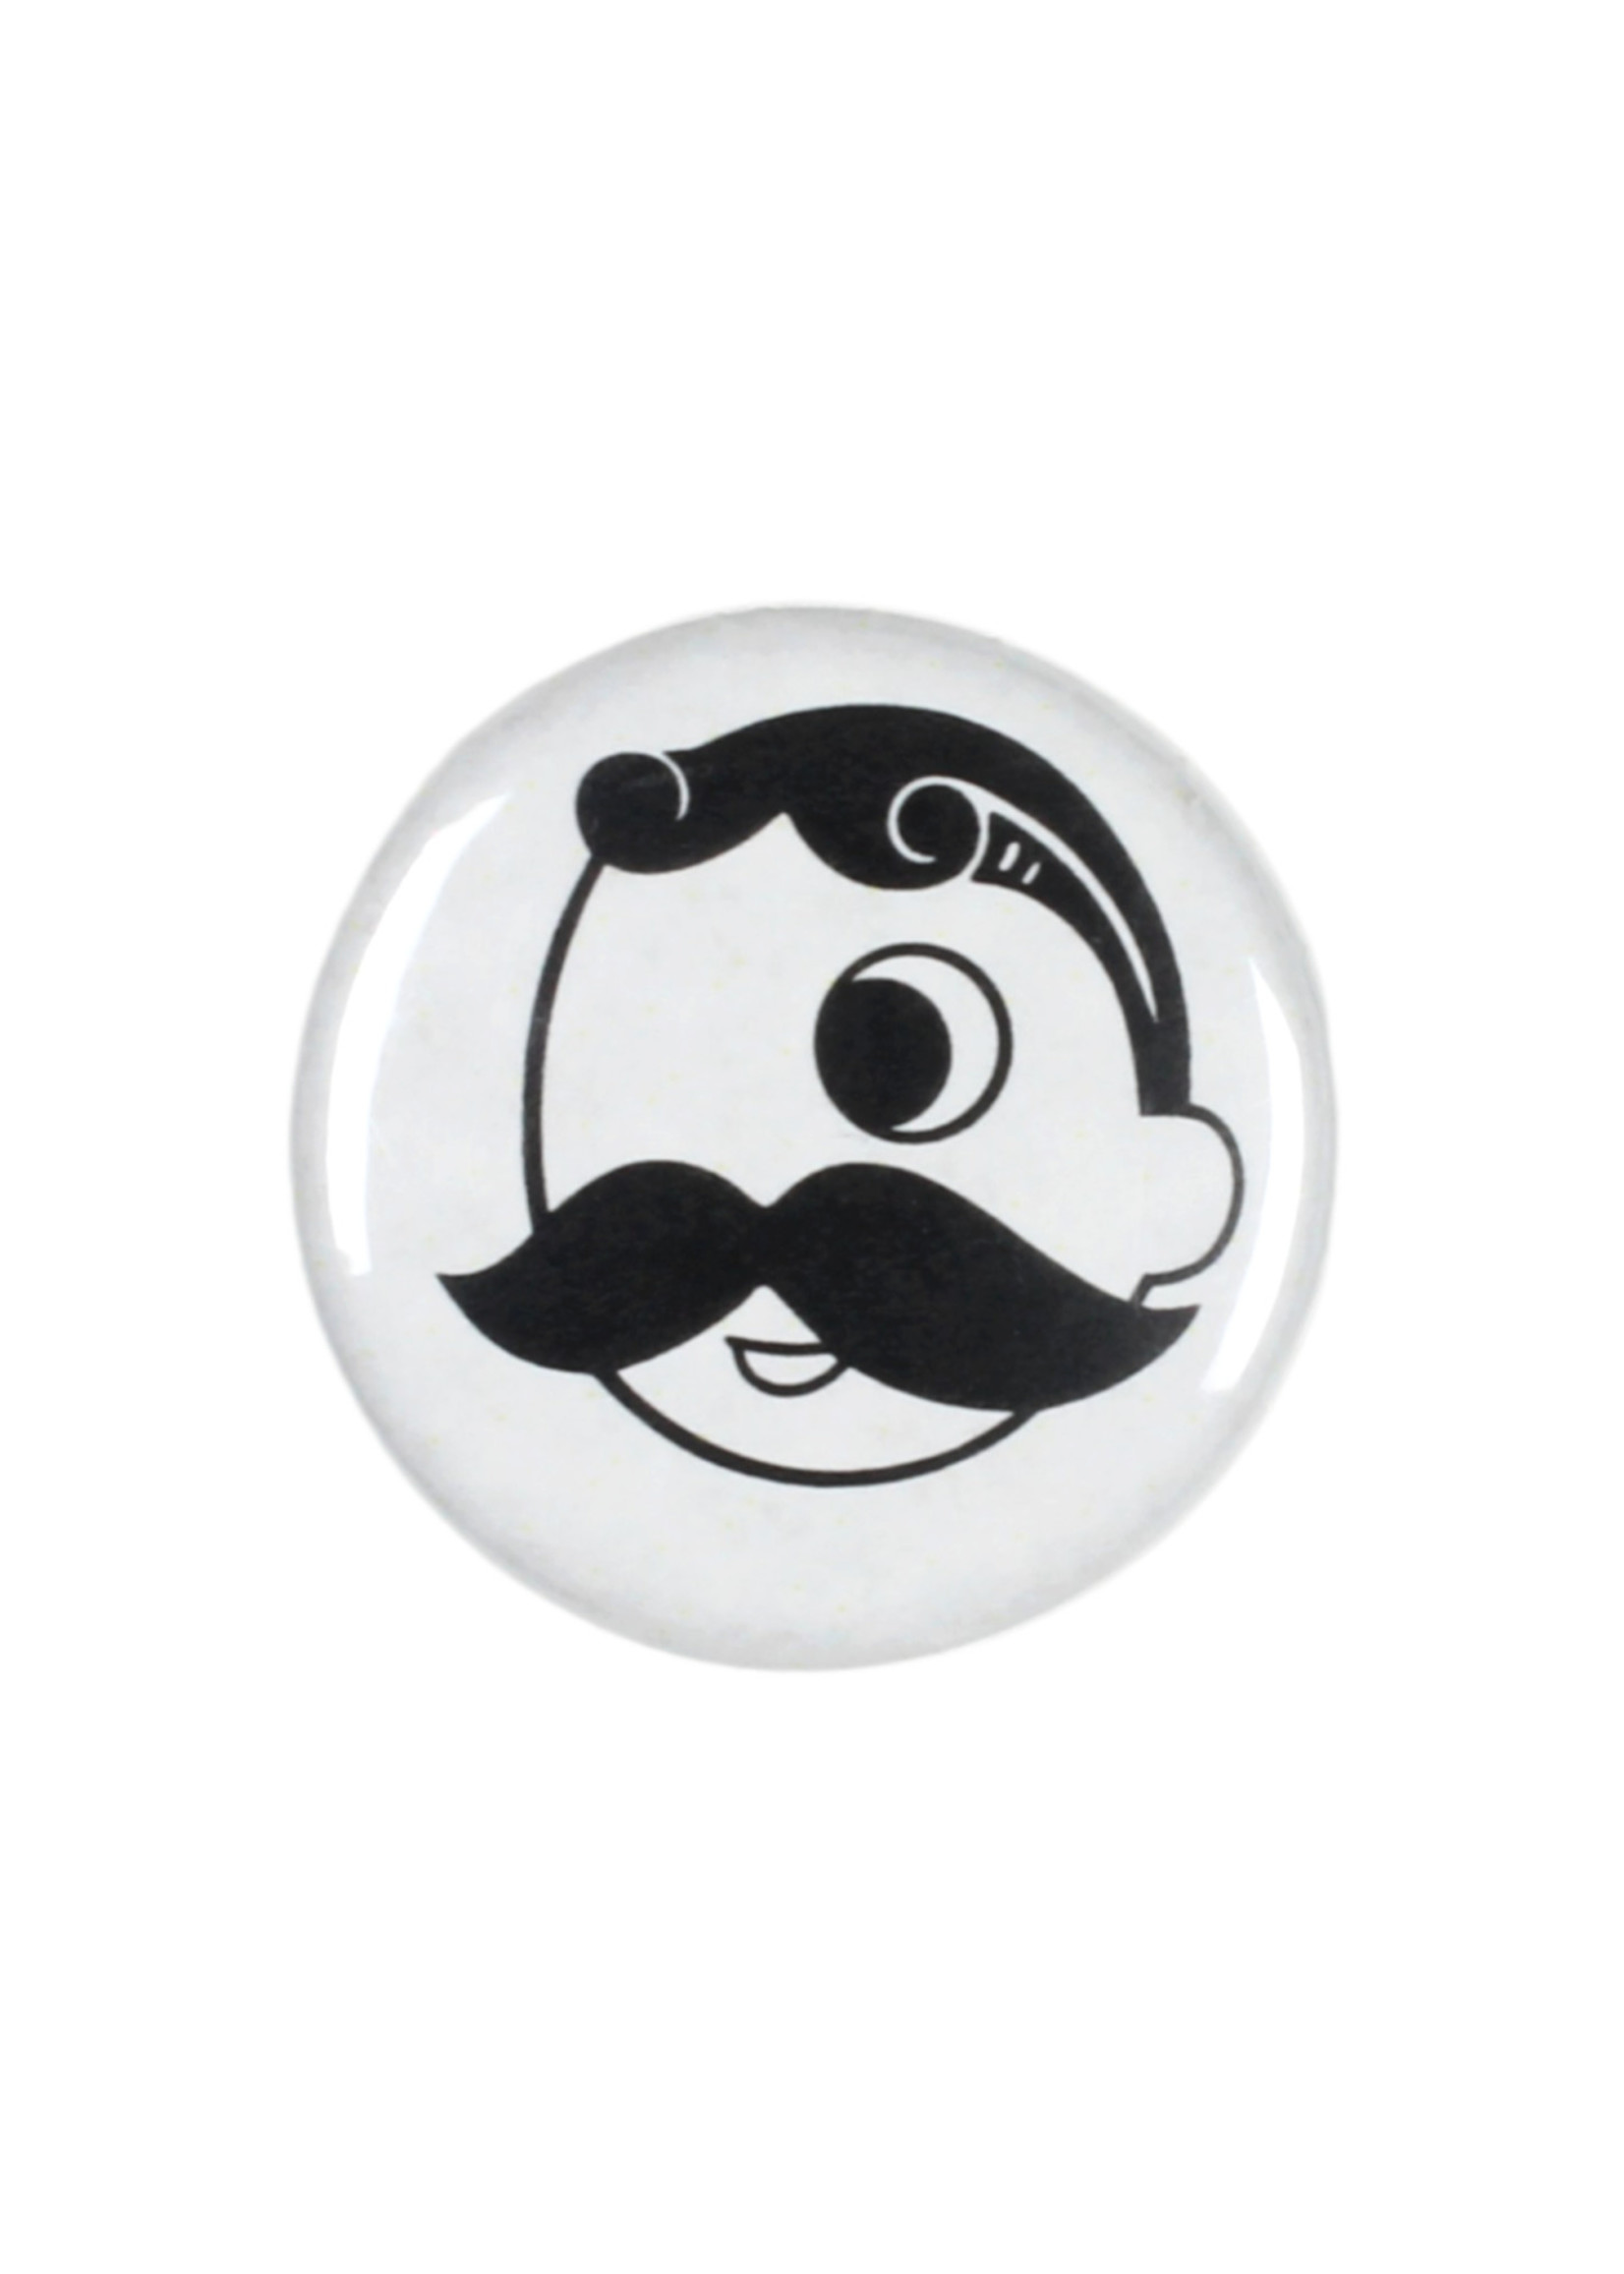 Natty Boh Natty Boh Mini Logo Button